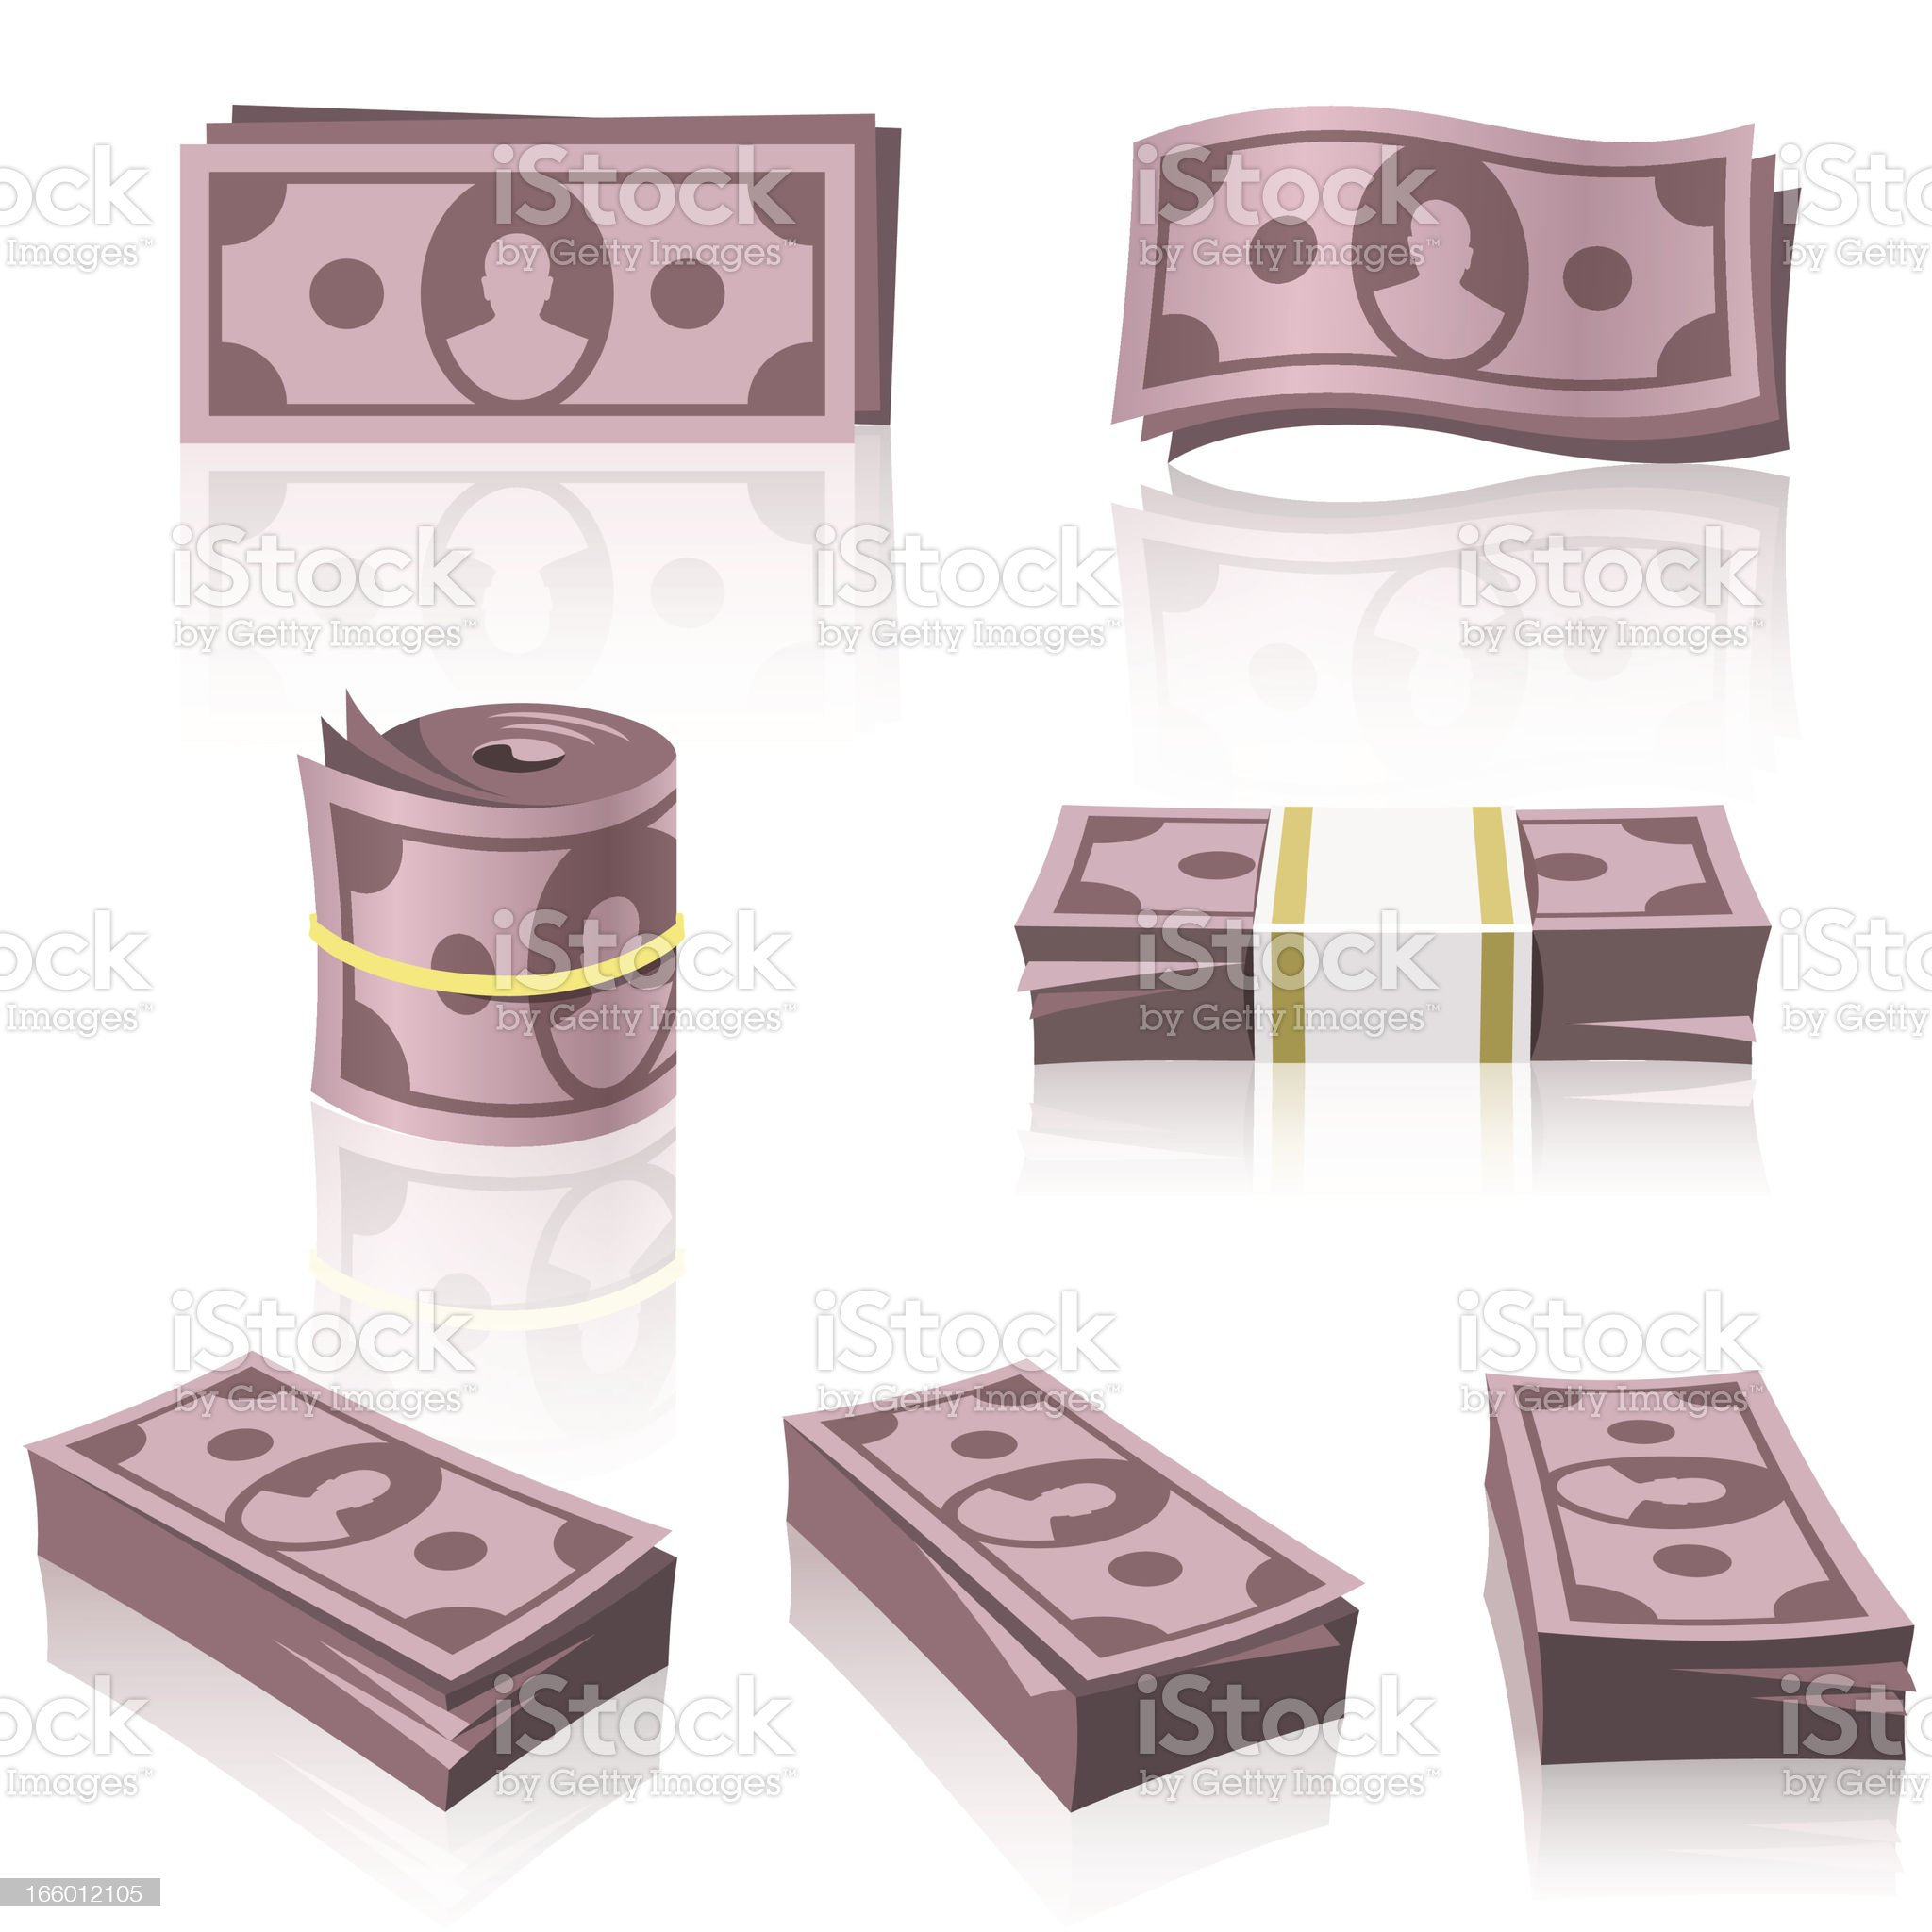 RED MONEY STACKS royalty-free stock vector art